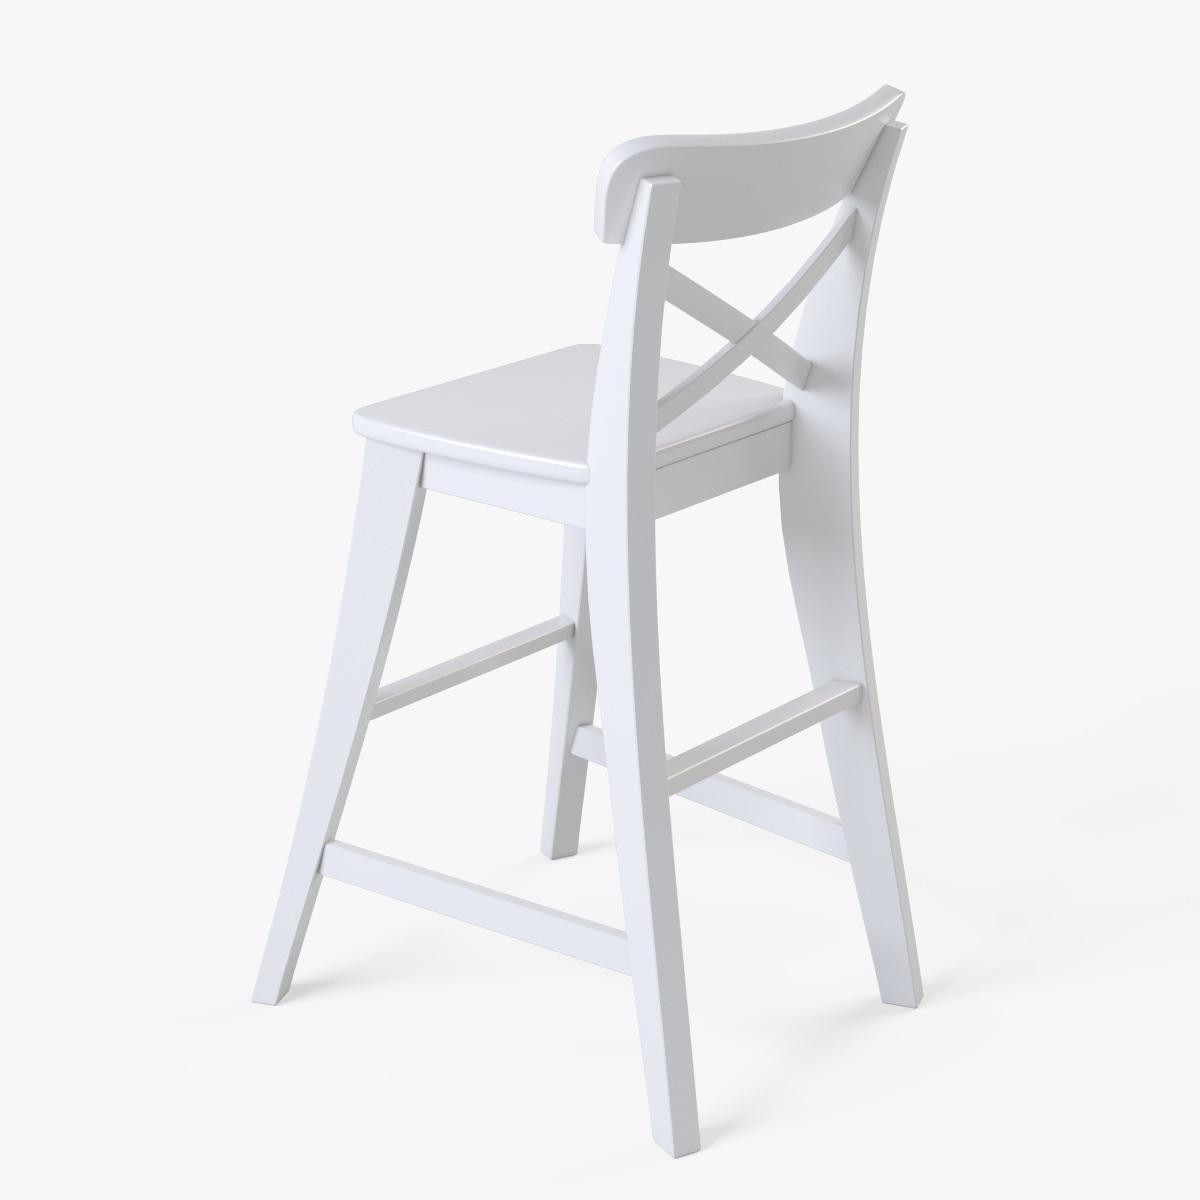 Wondrous Junior Chair Ikea Ingolf White Andrewgaddart Wooden Chair Designs For Living Room Andrewgaddartcom